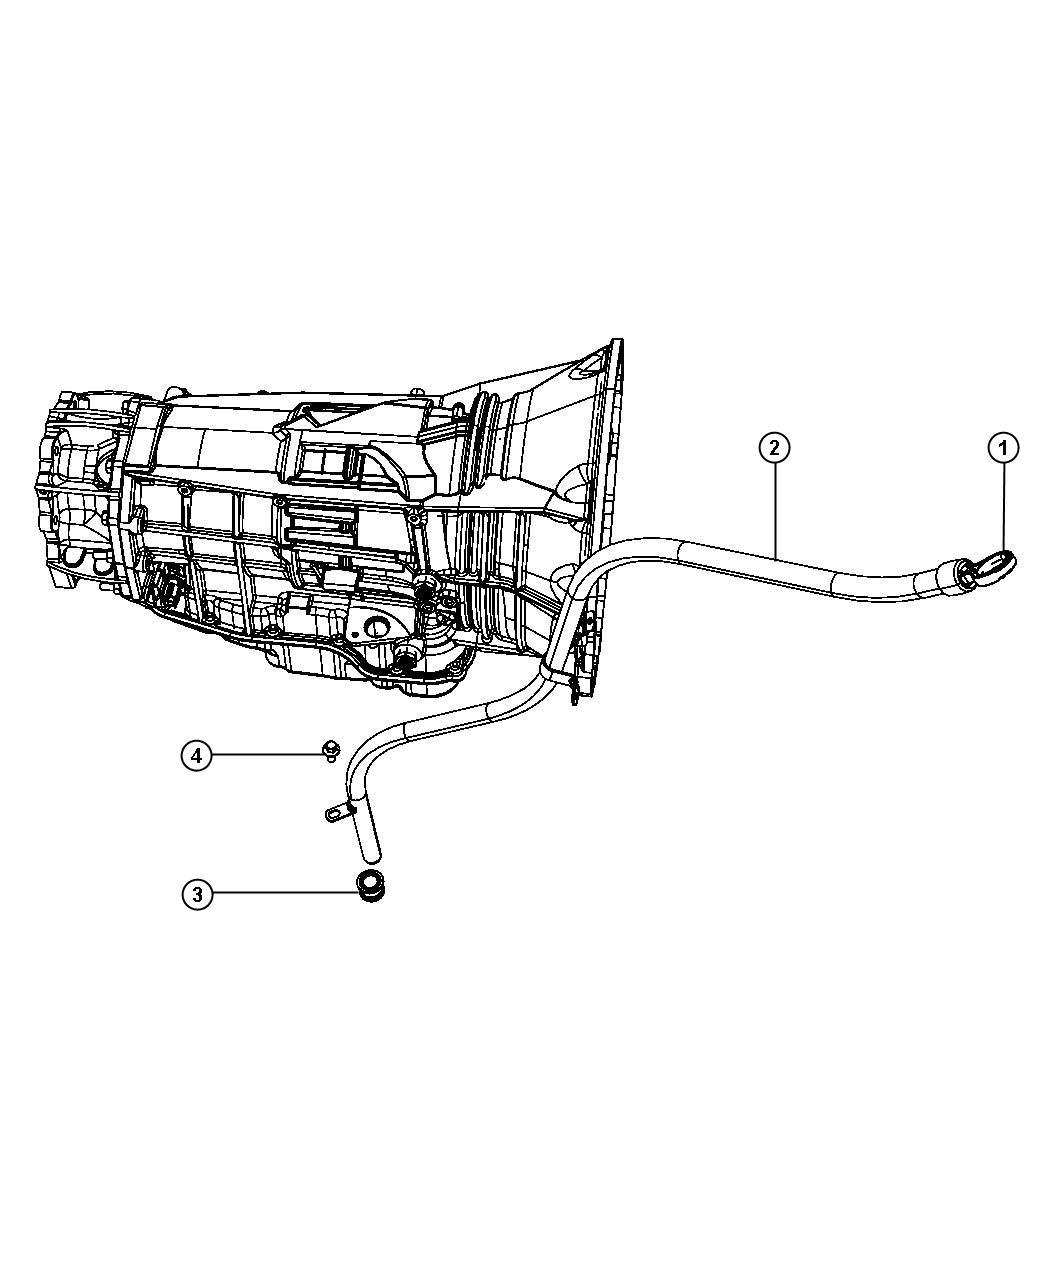 2011 Dodge Grand Caravan Indicator. Transmission fluid